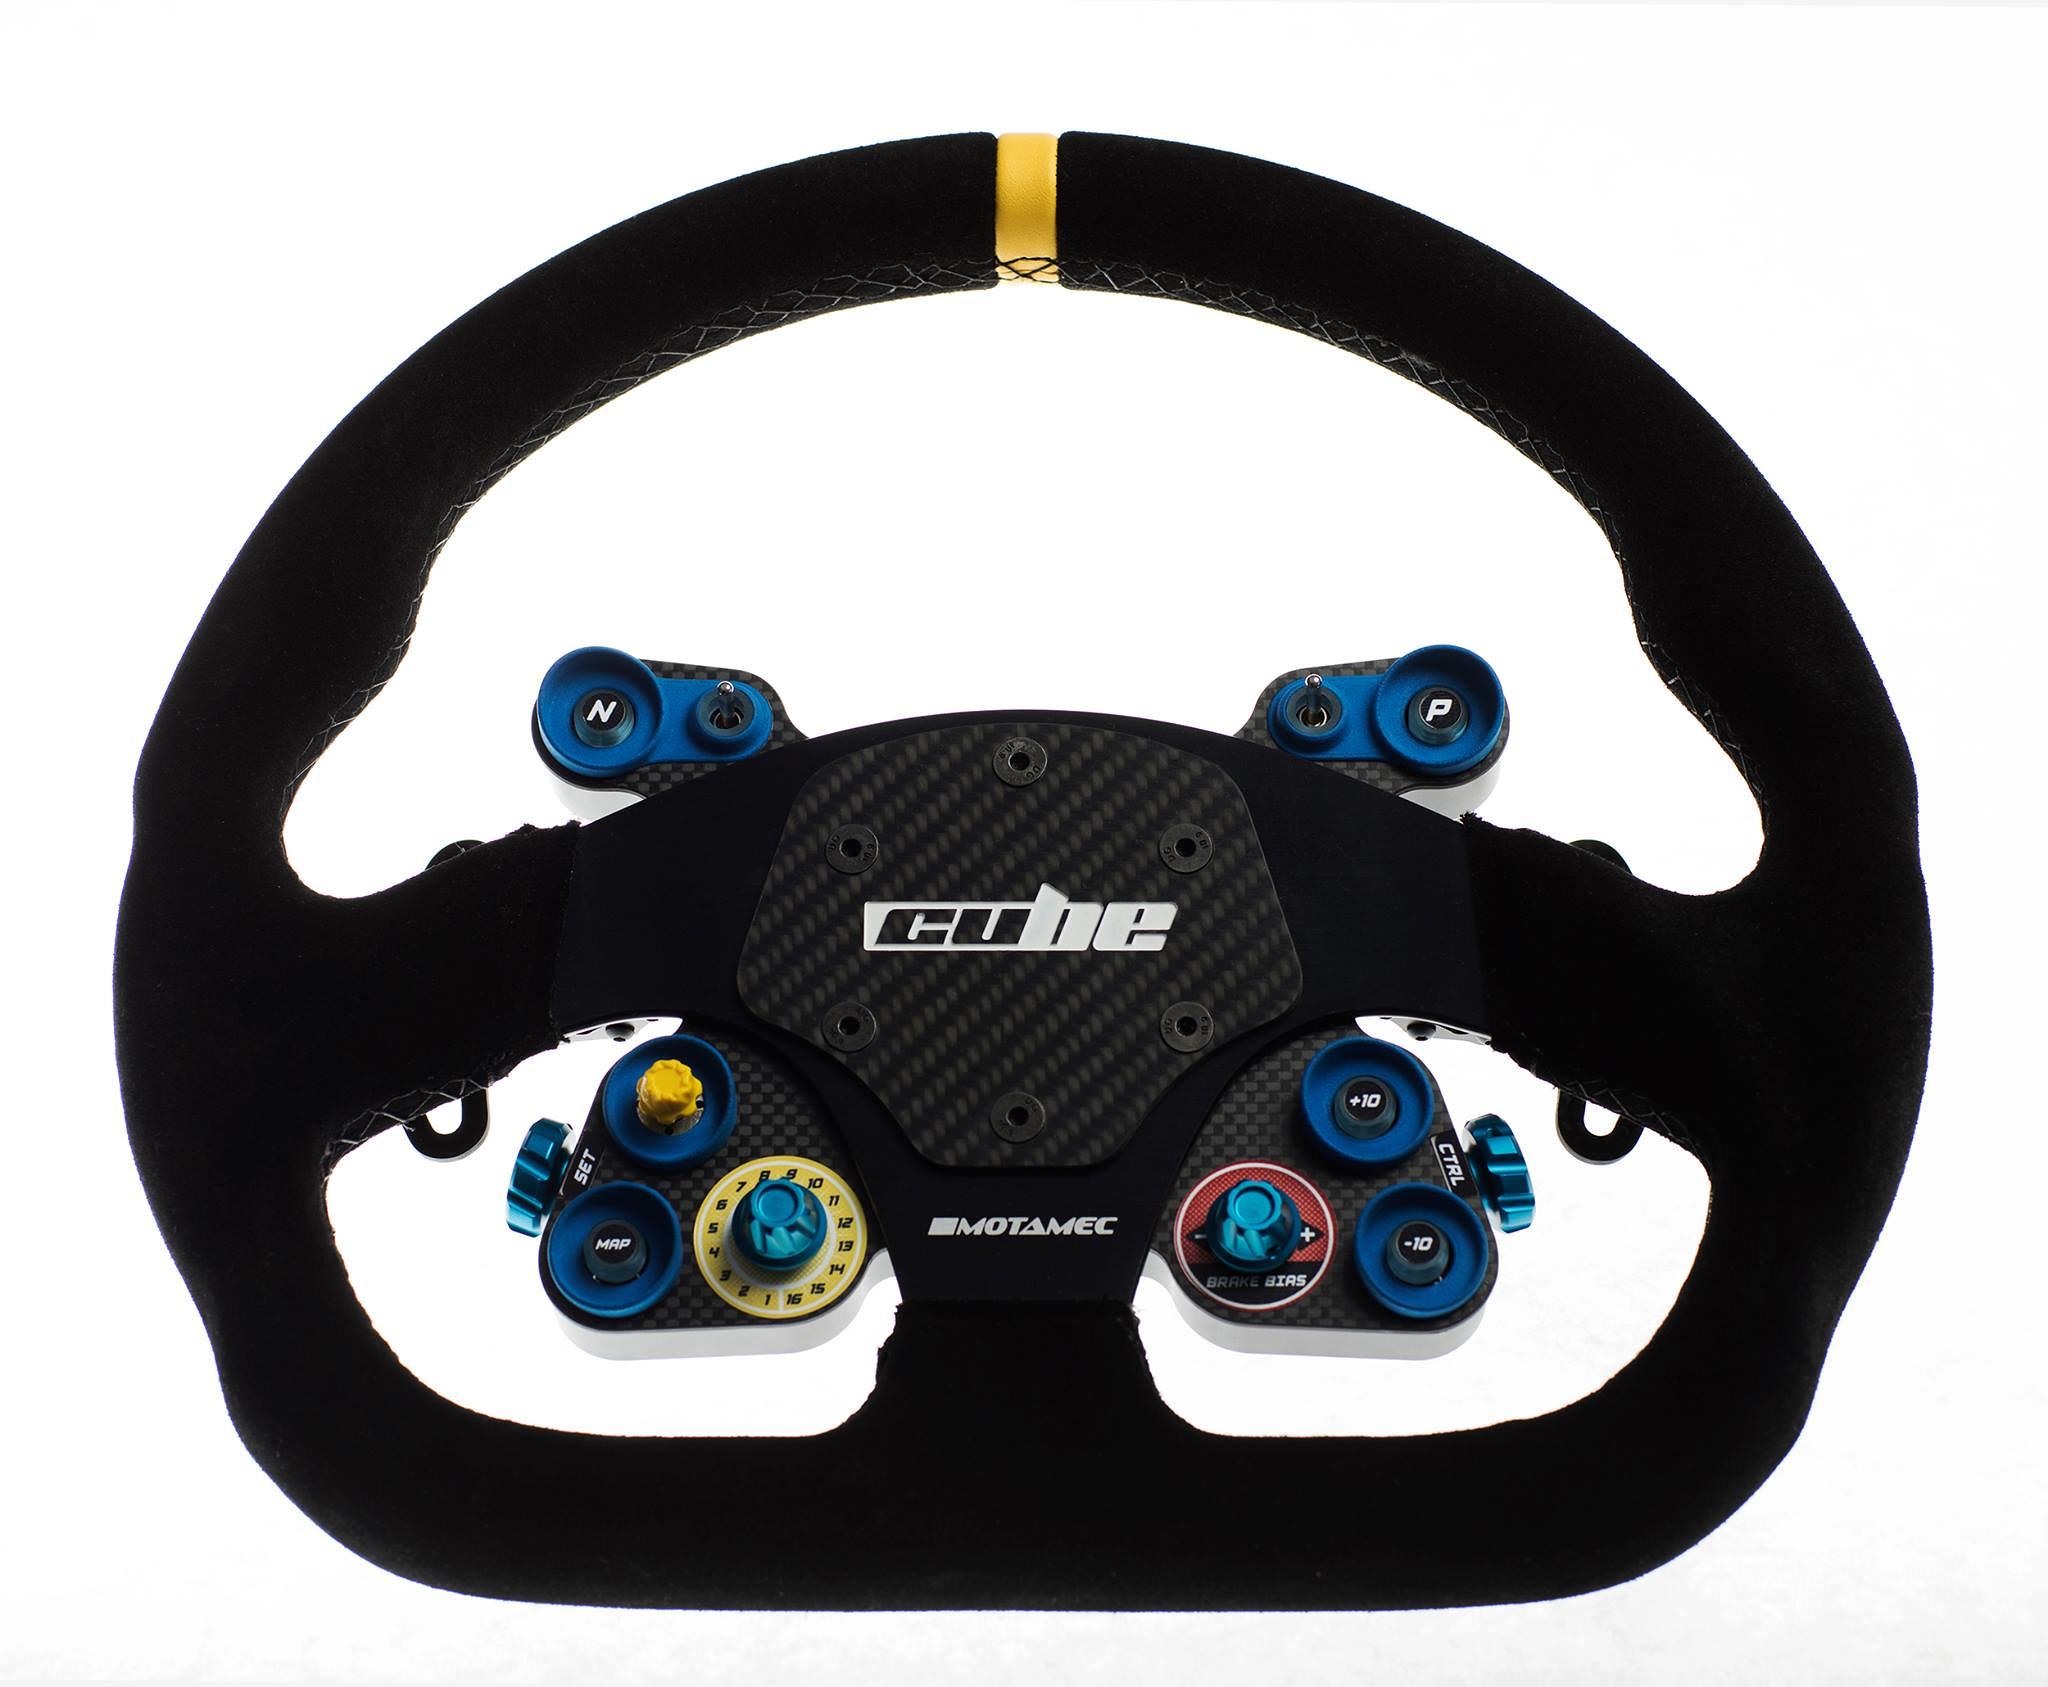 Cube Touring steering wheel 4